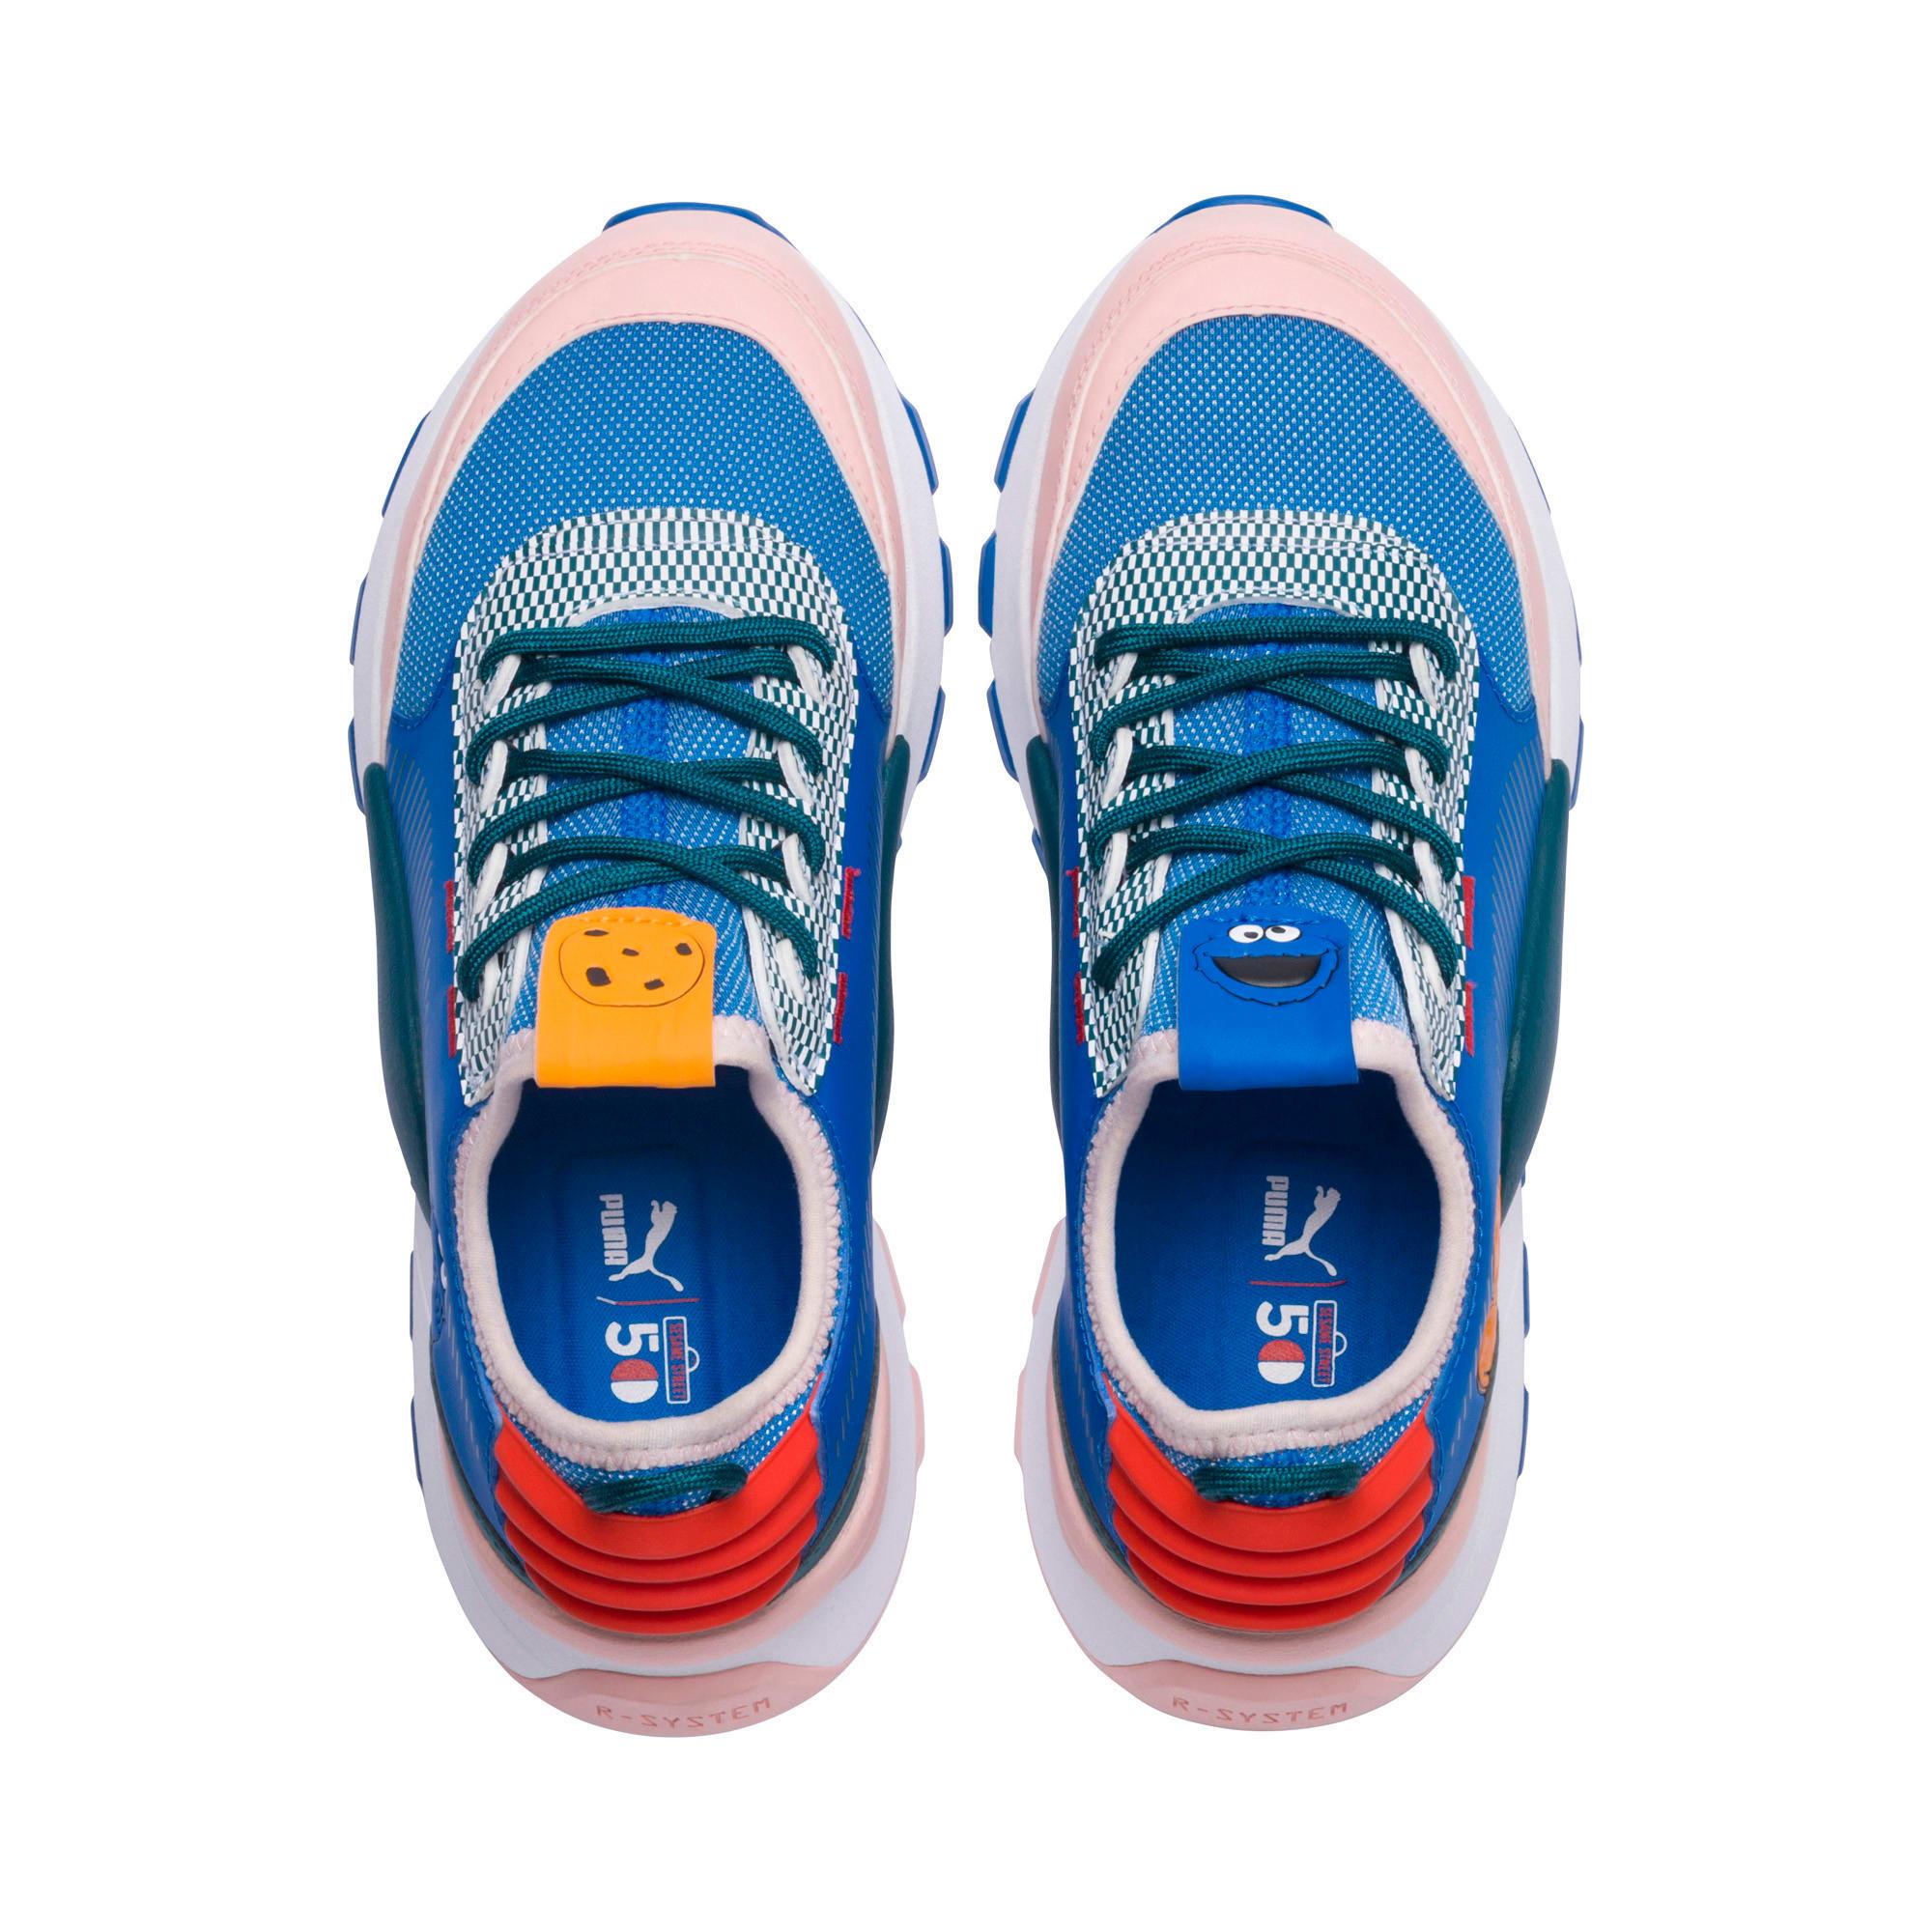 Thumbnail 6 of Sesame Street 50 RS-0 Little Kids' Shoes, Veiled Rose-Indigo-BlueCoral, medium